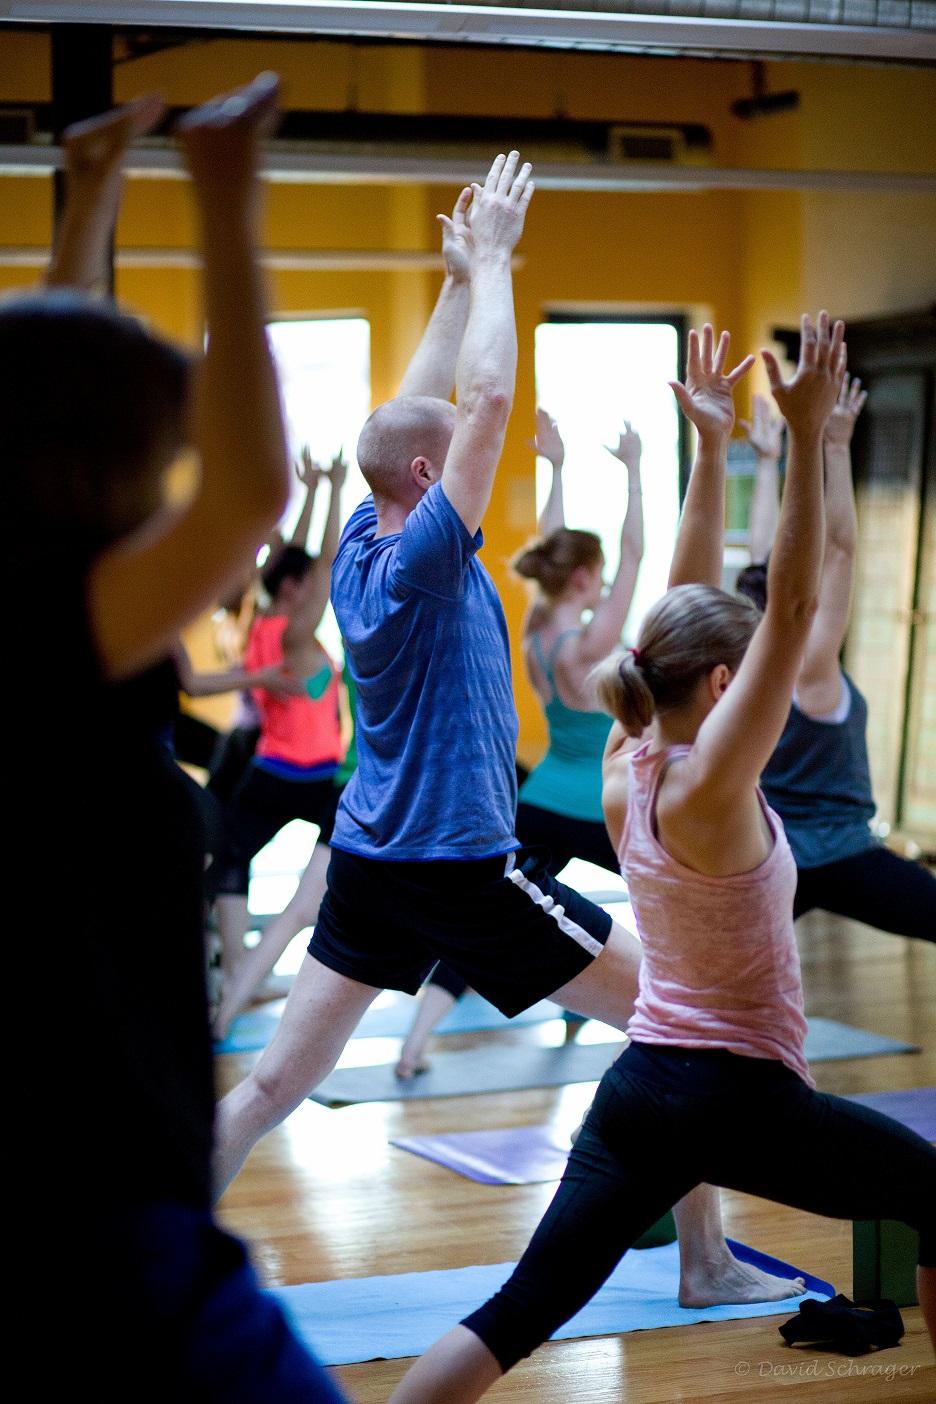 yoga day 2015 (3).JPG